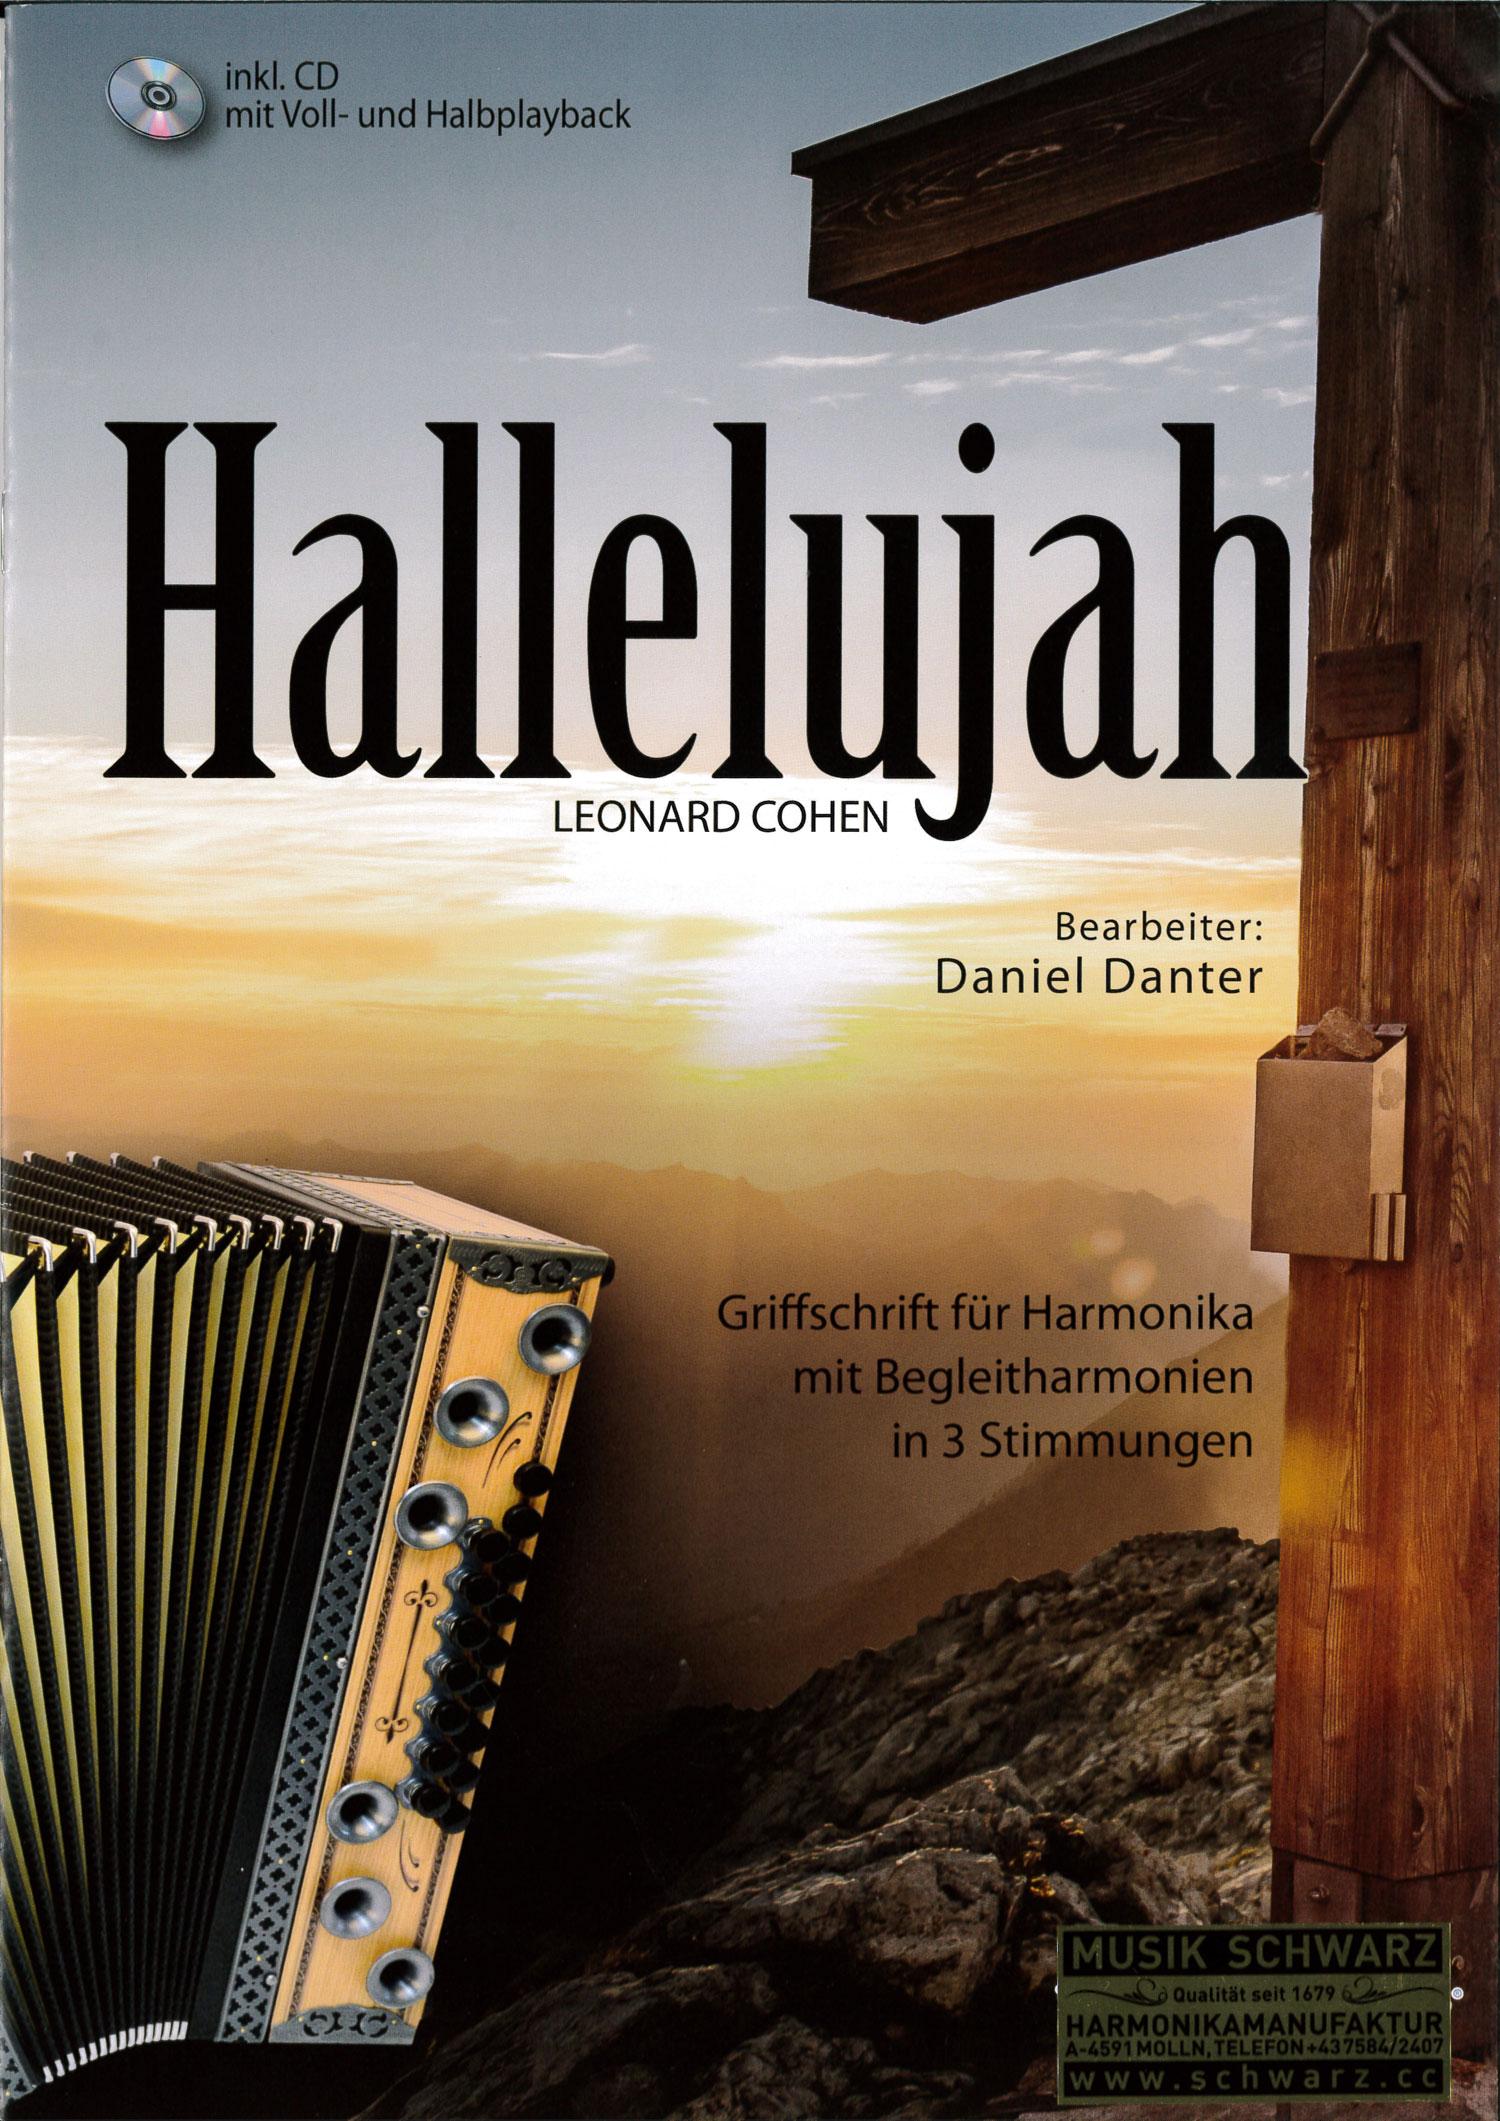 Hallelujah (Leonard Cohen) - Kärntnerland